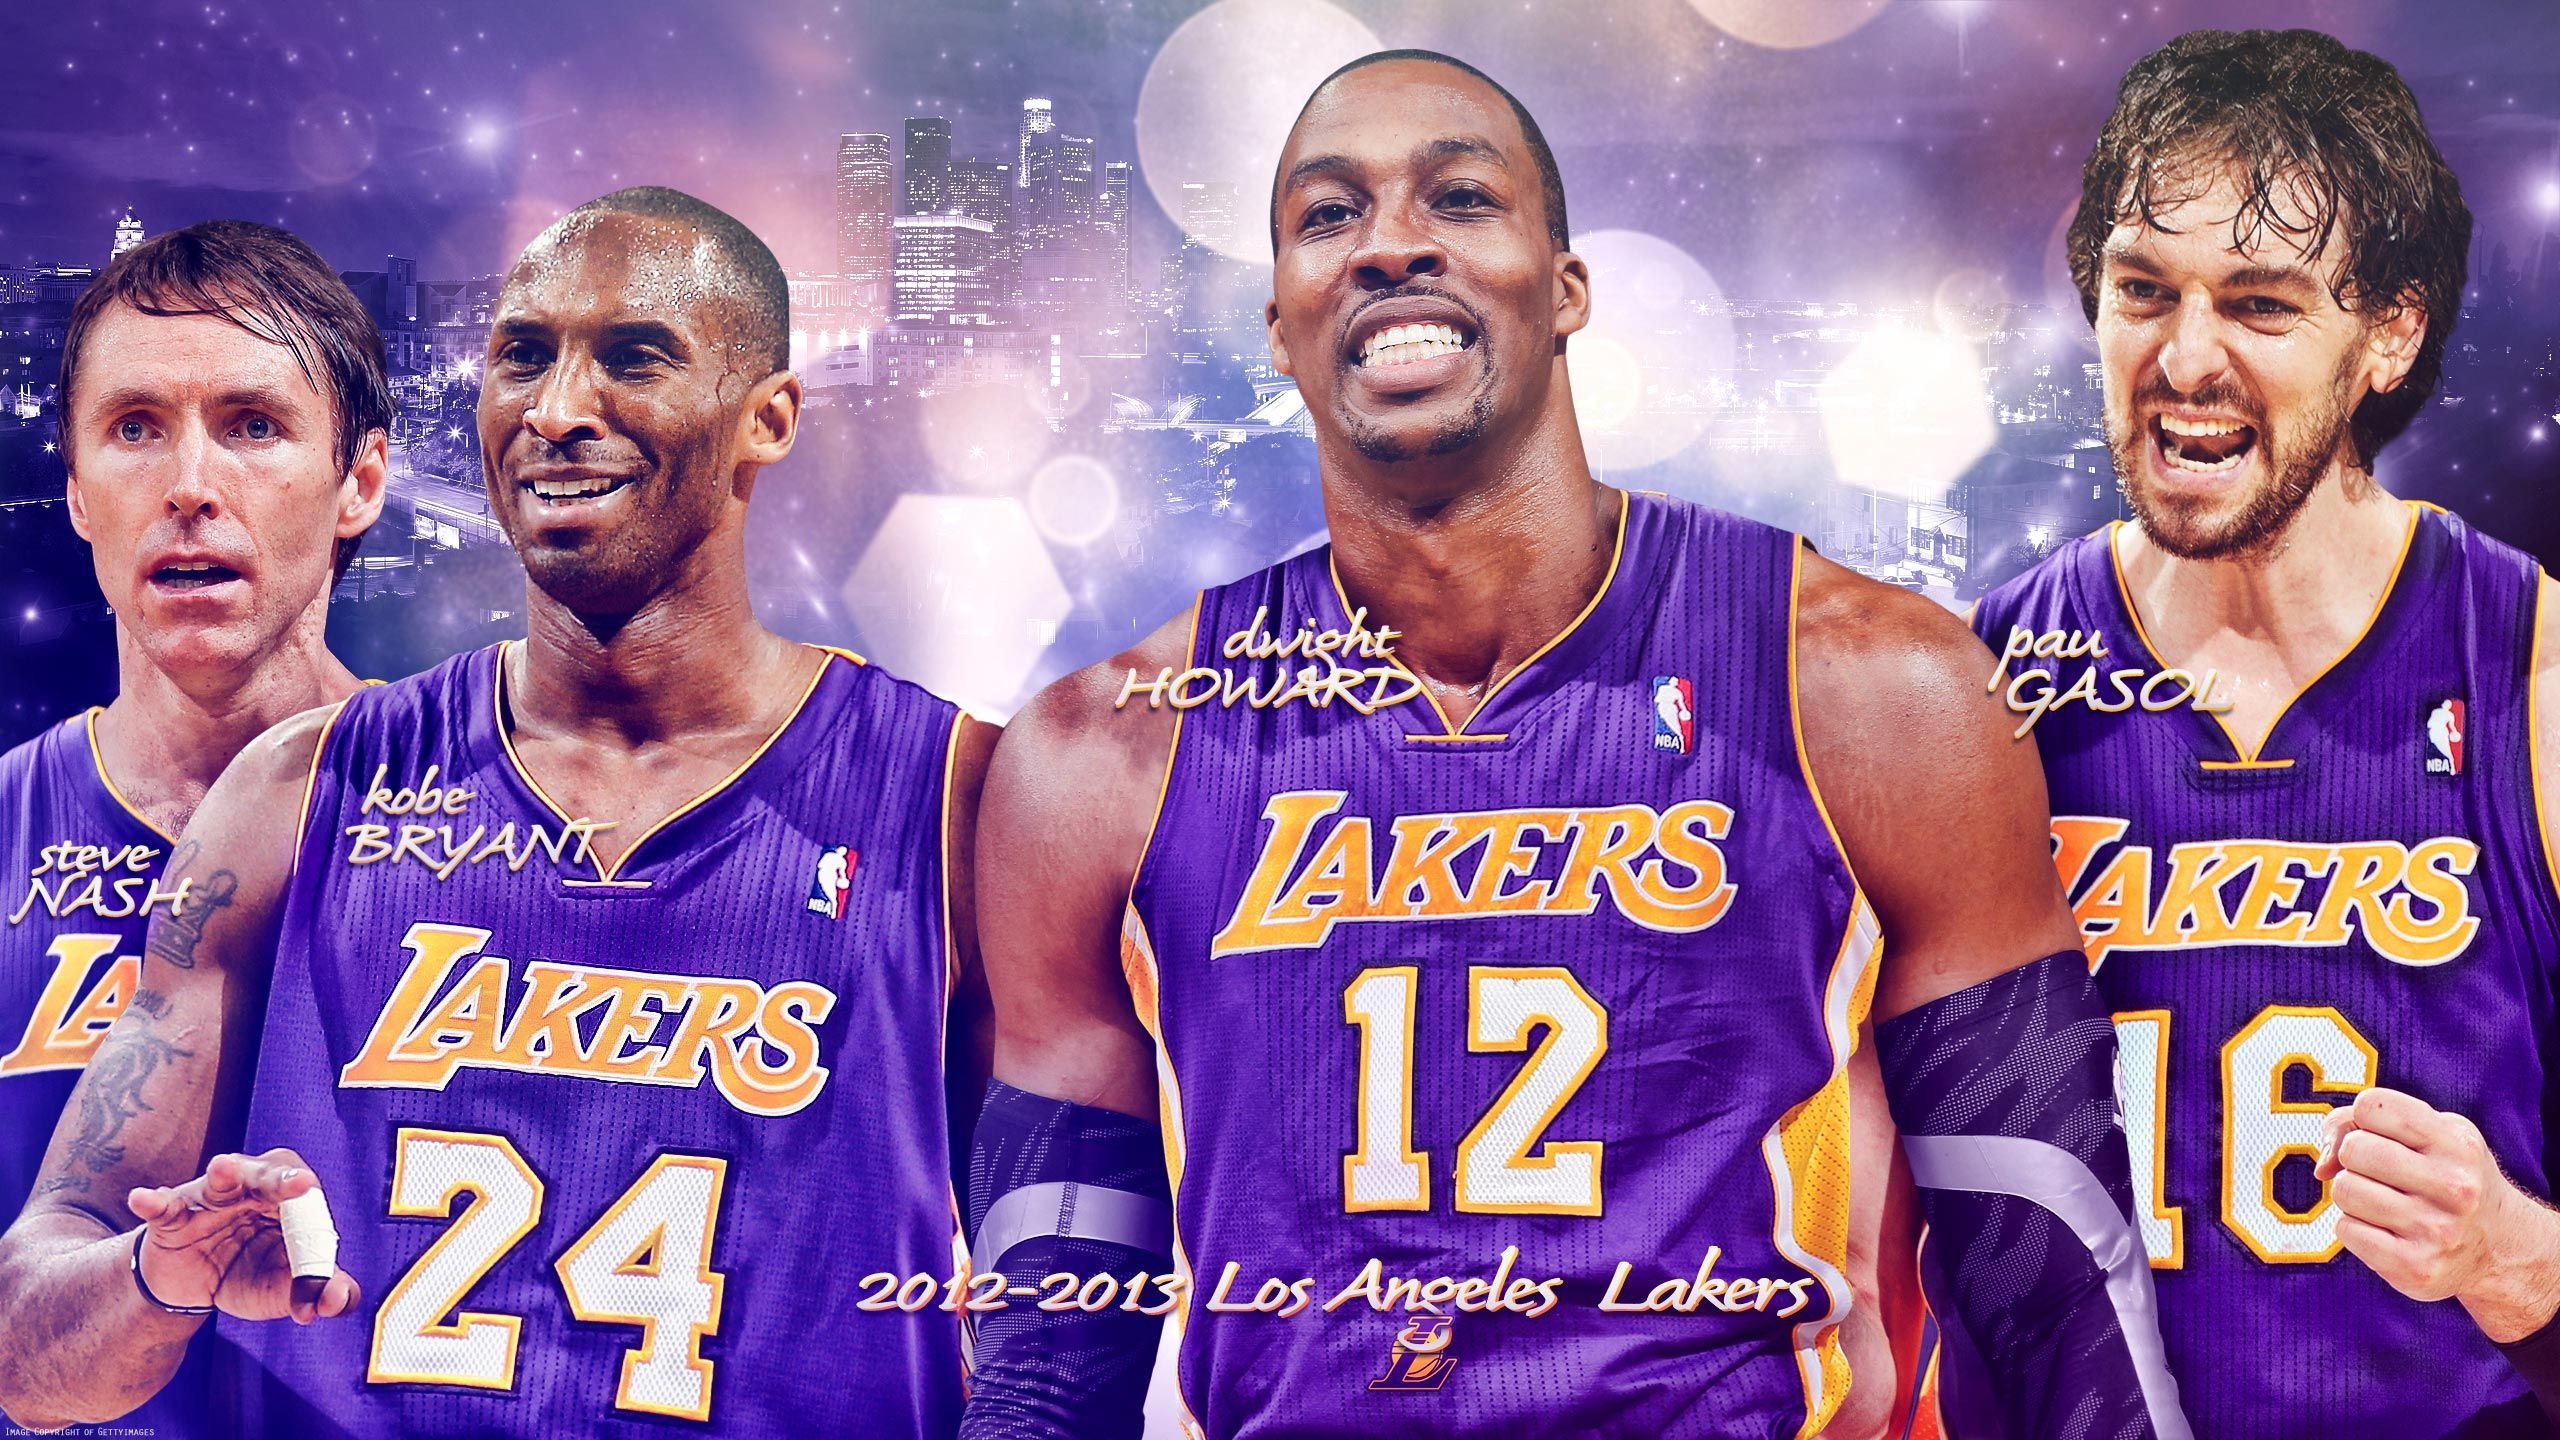 What A Great Roster For La Nba Legends Nba La Lakers